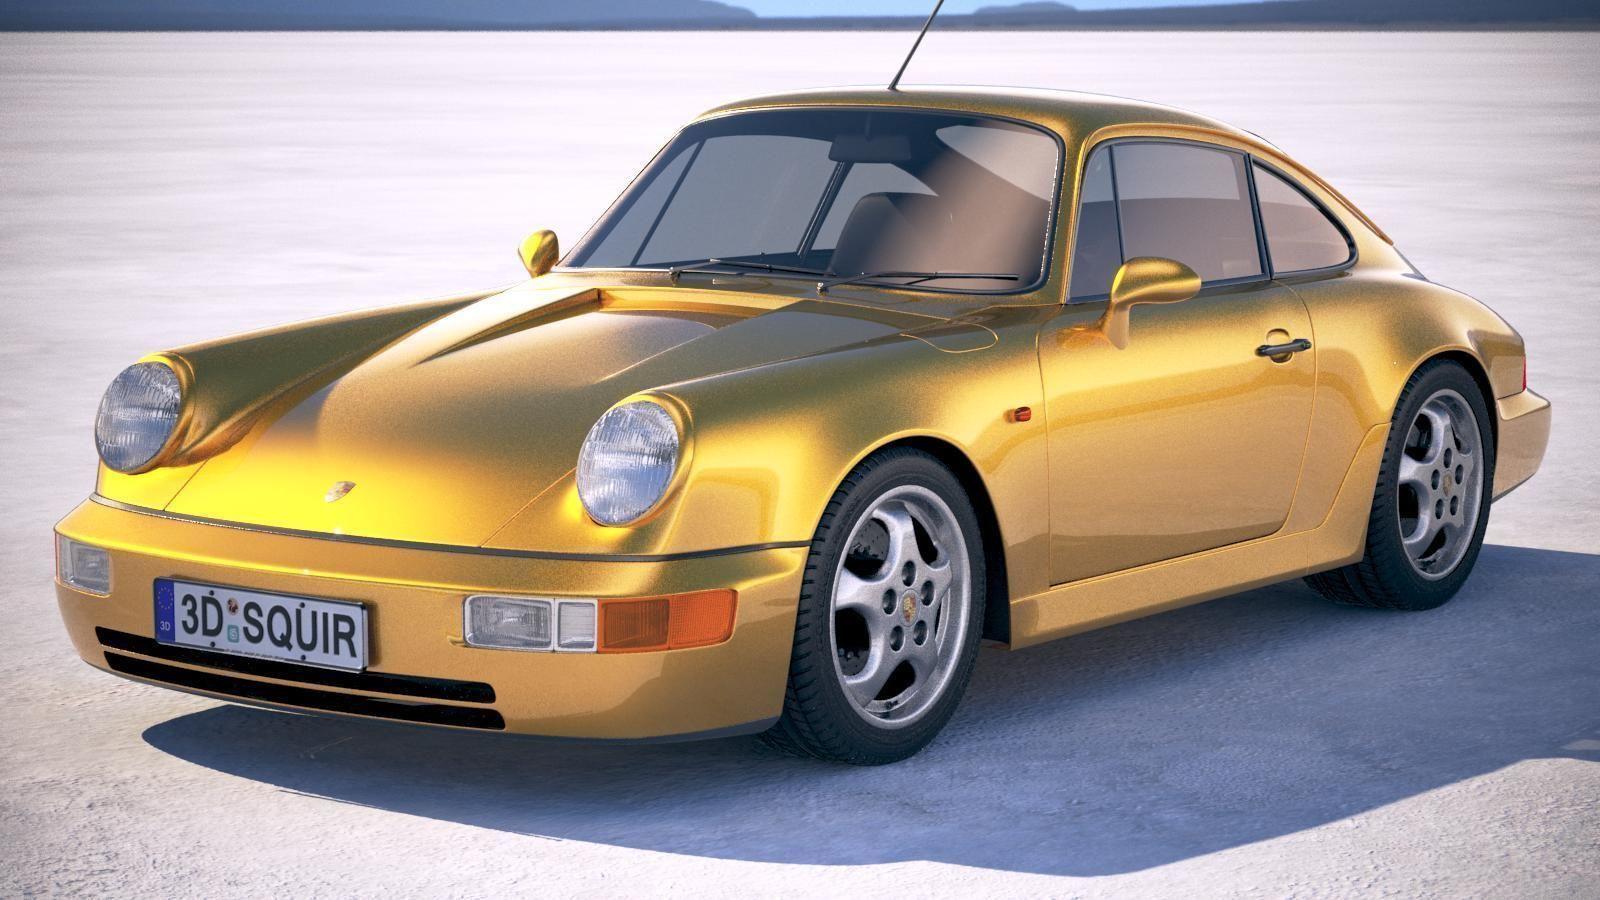 Porsche 911 964 Carrera 1990